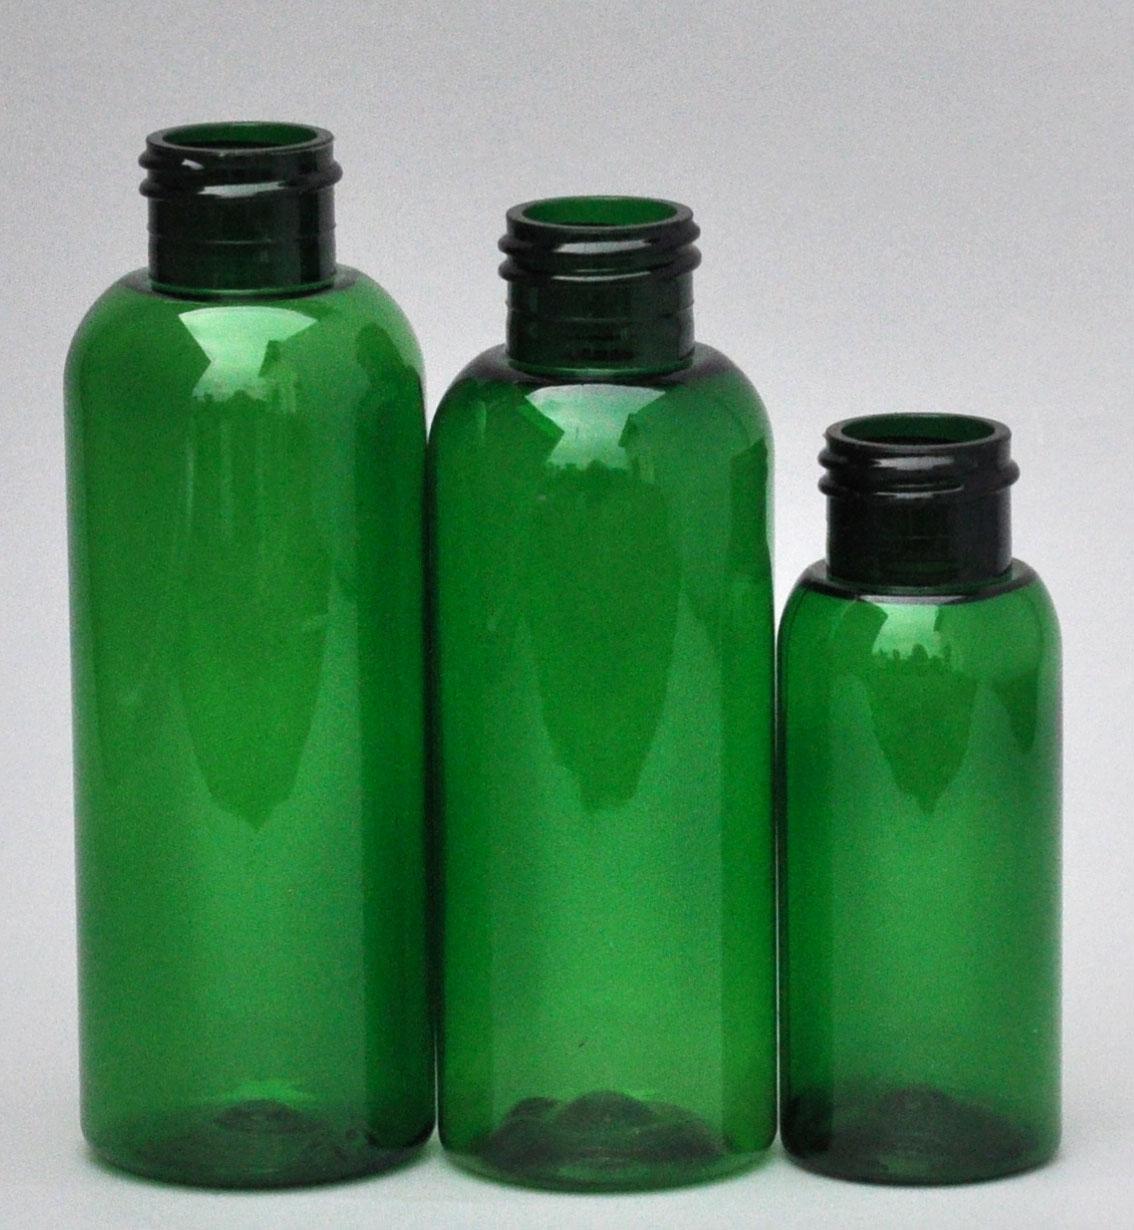 SNEP-125BPETG-125ml Green PET Boston Bottle with 24/410 Neck